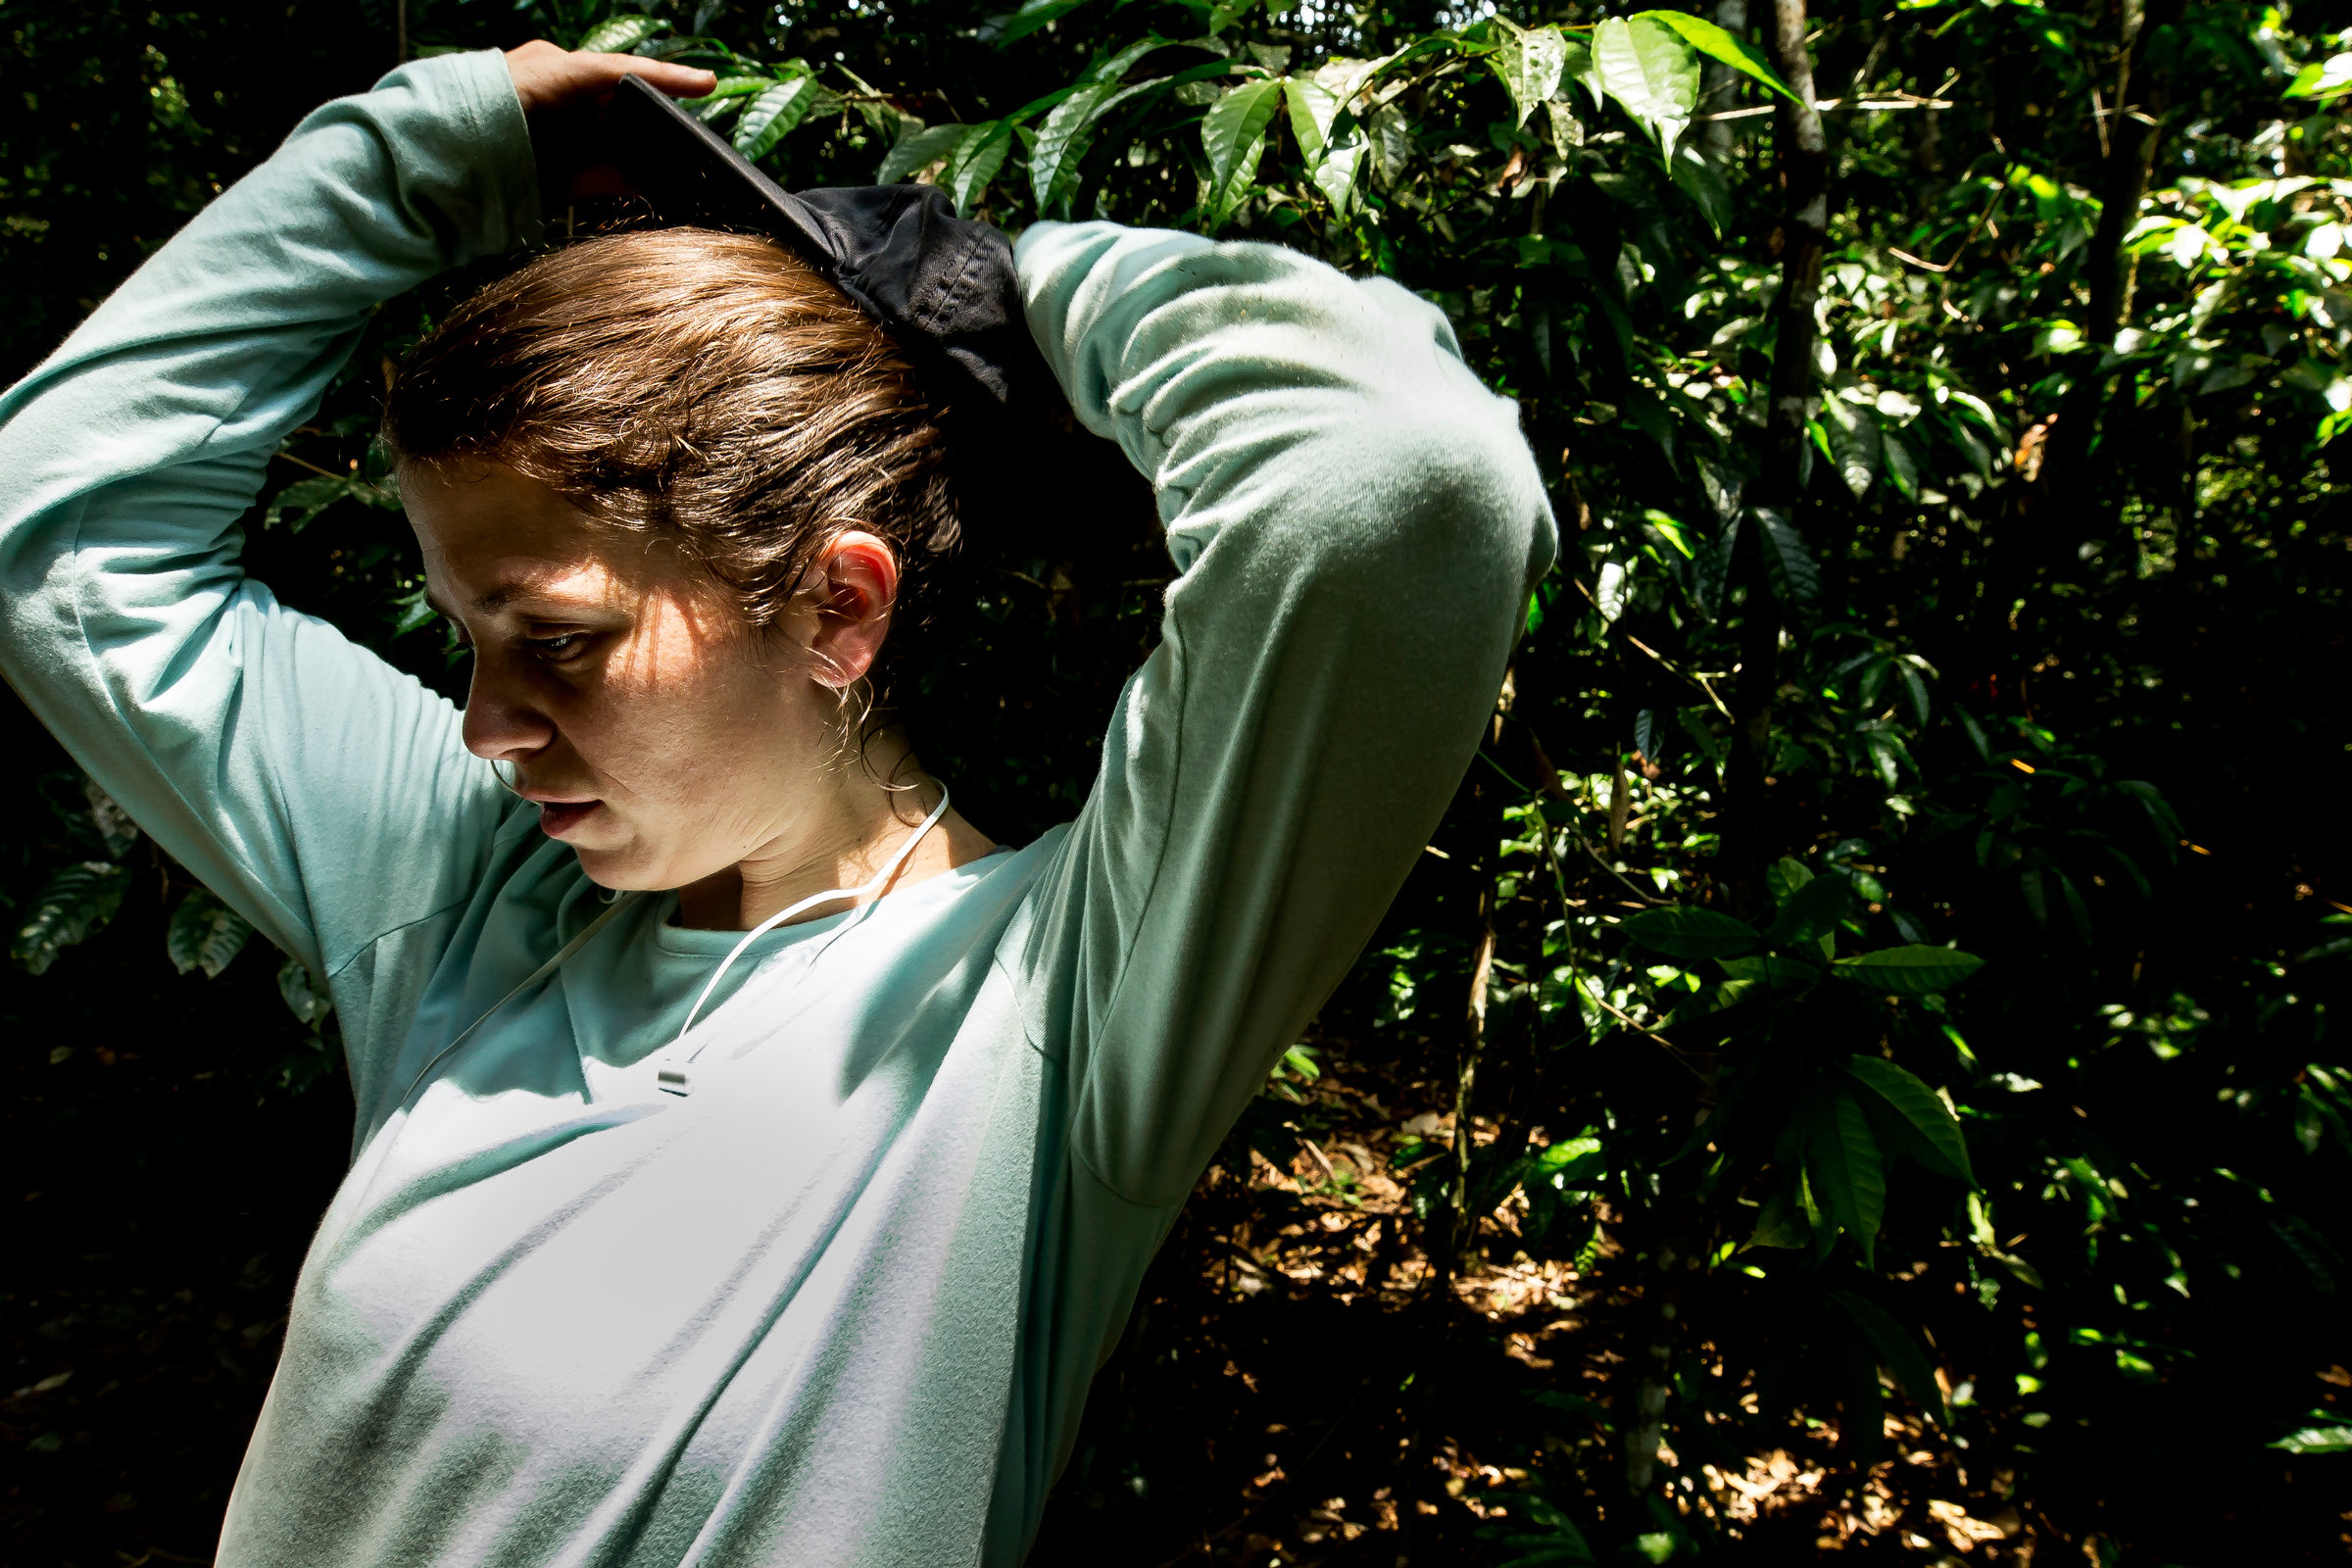 Elizabeth Agee in the Amazon rainforest.